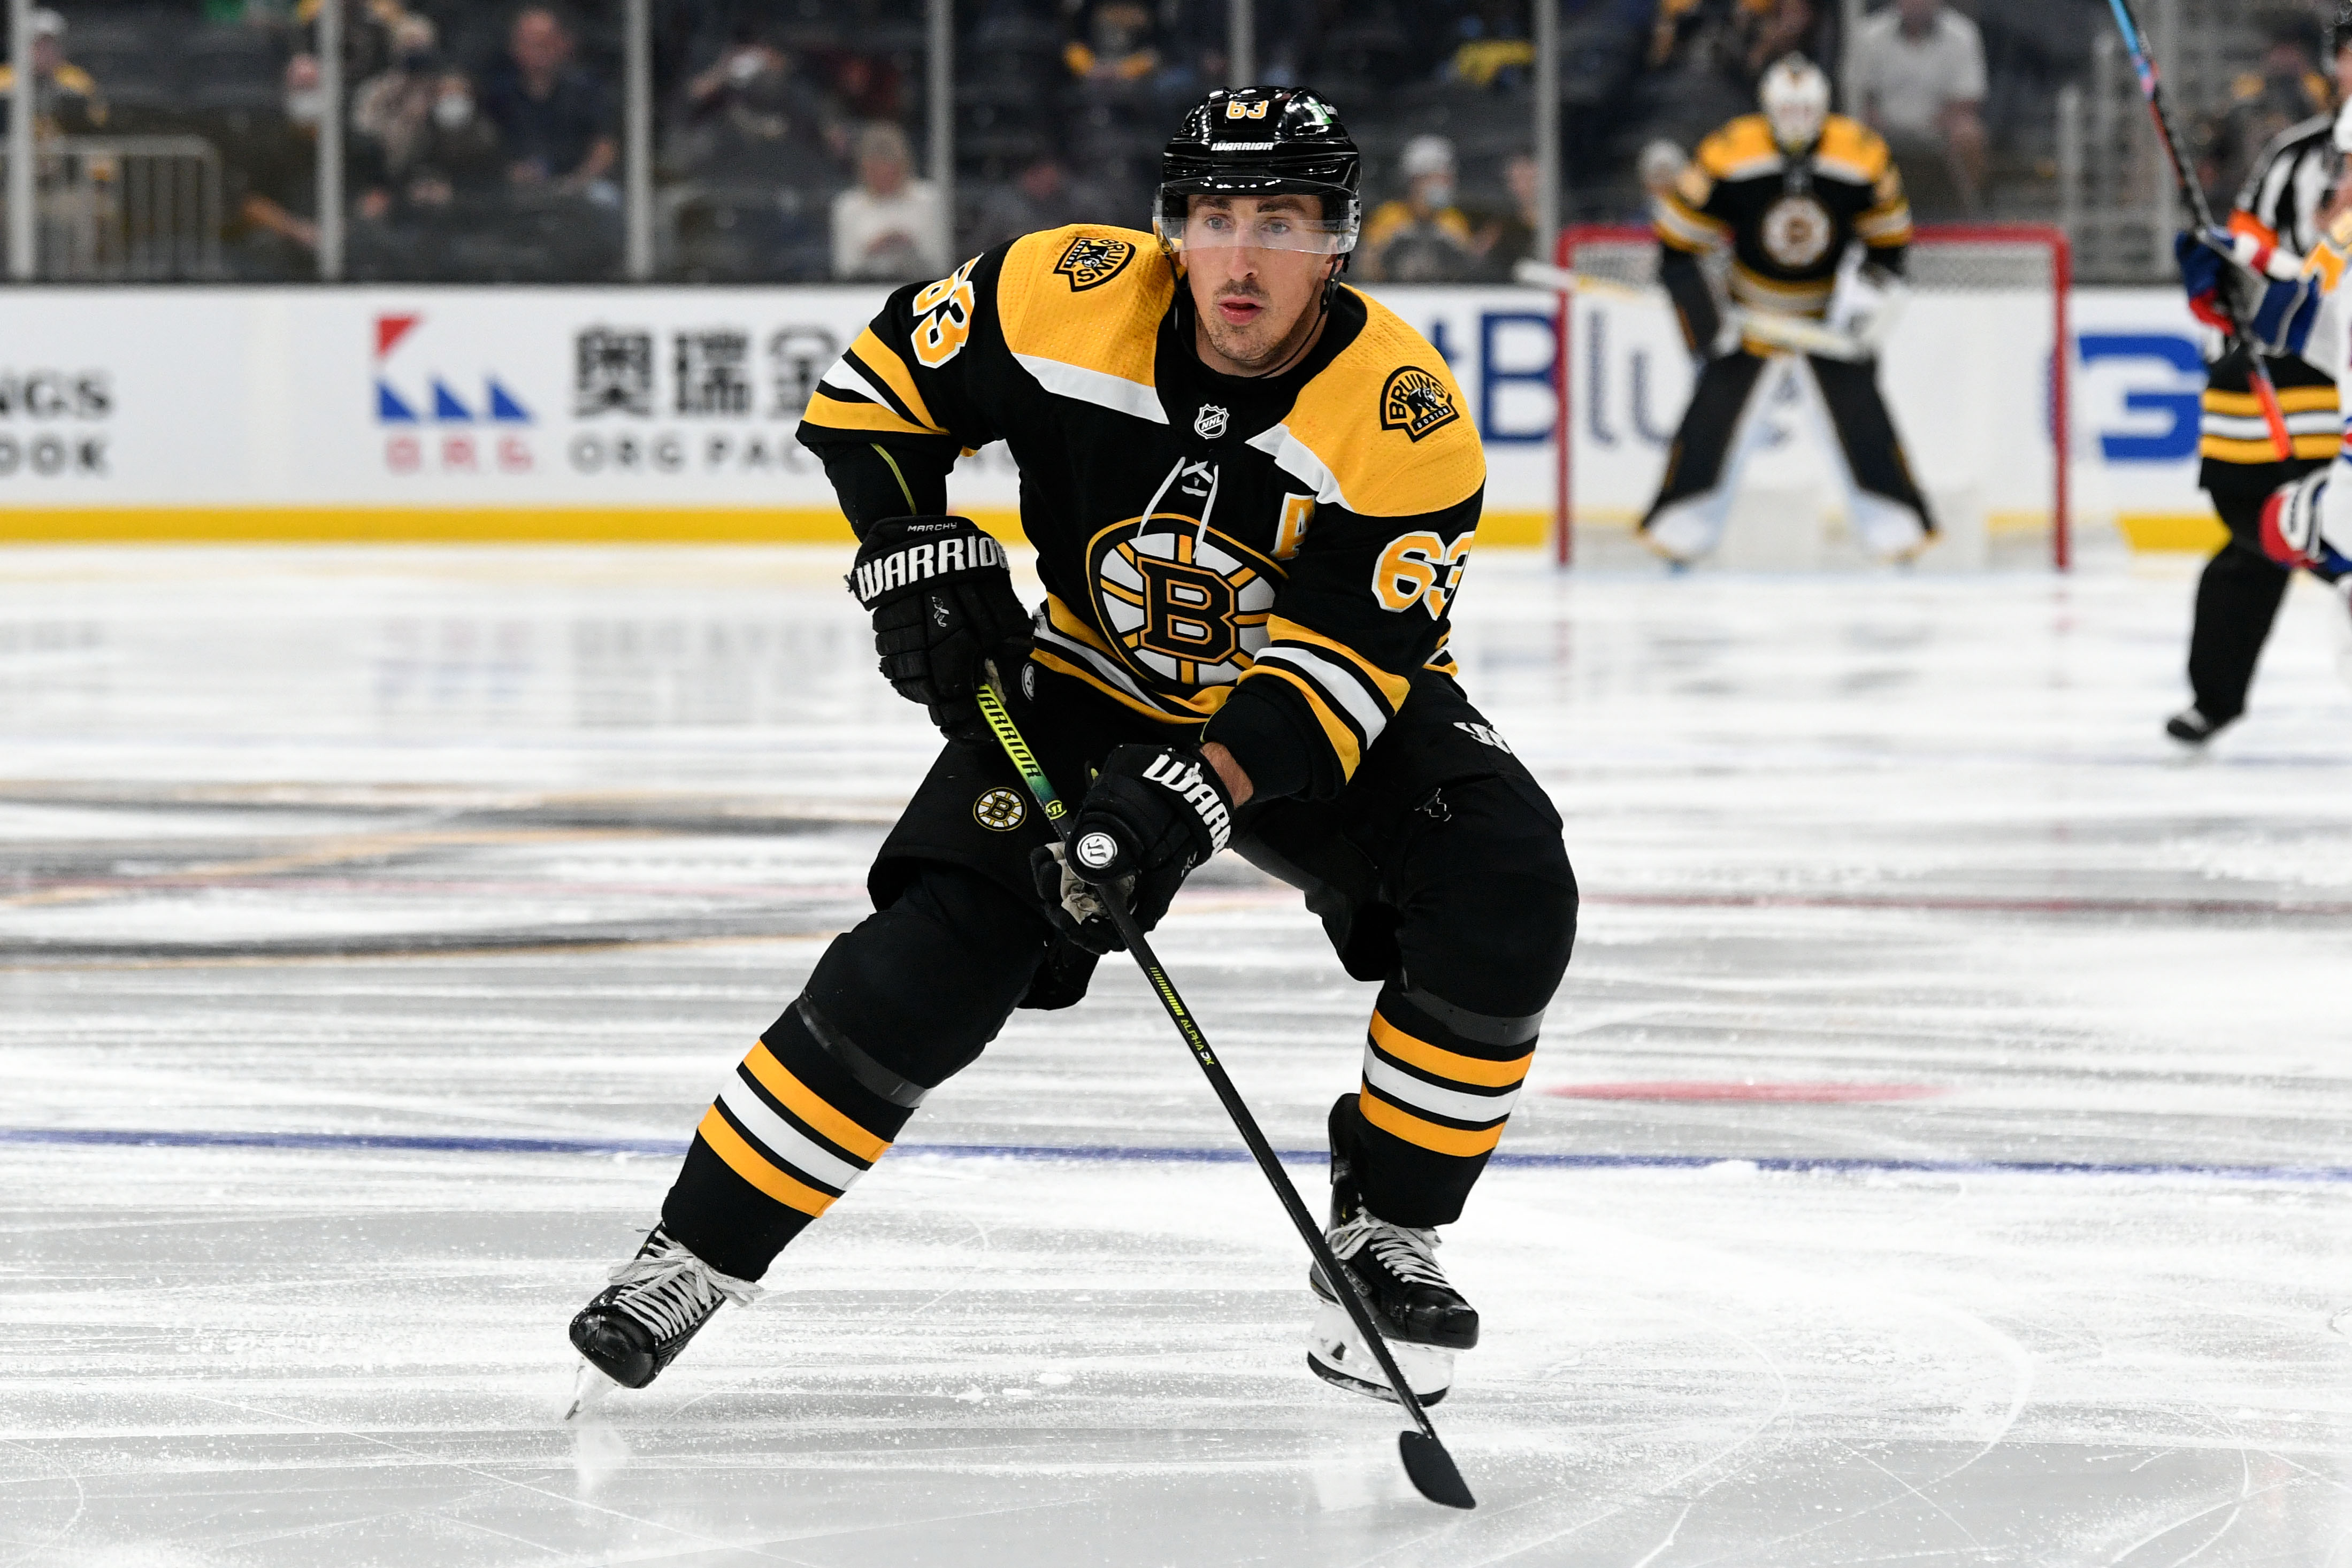 NHL: Preseason-New York Rangers at Boston Bruins